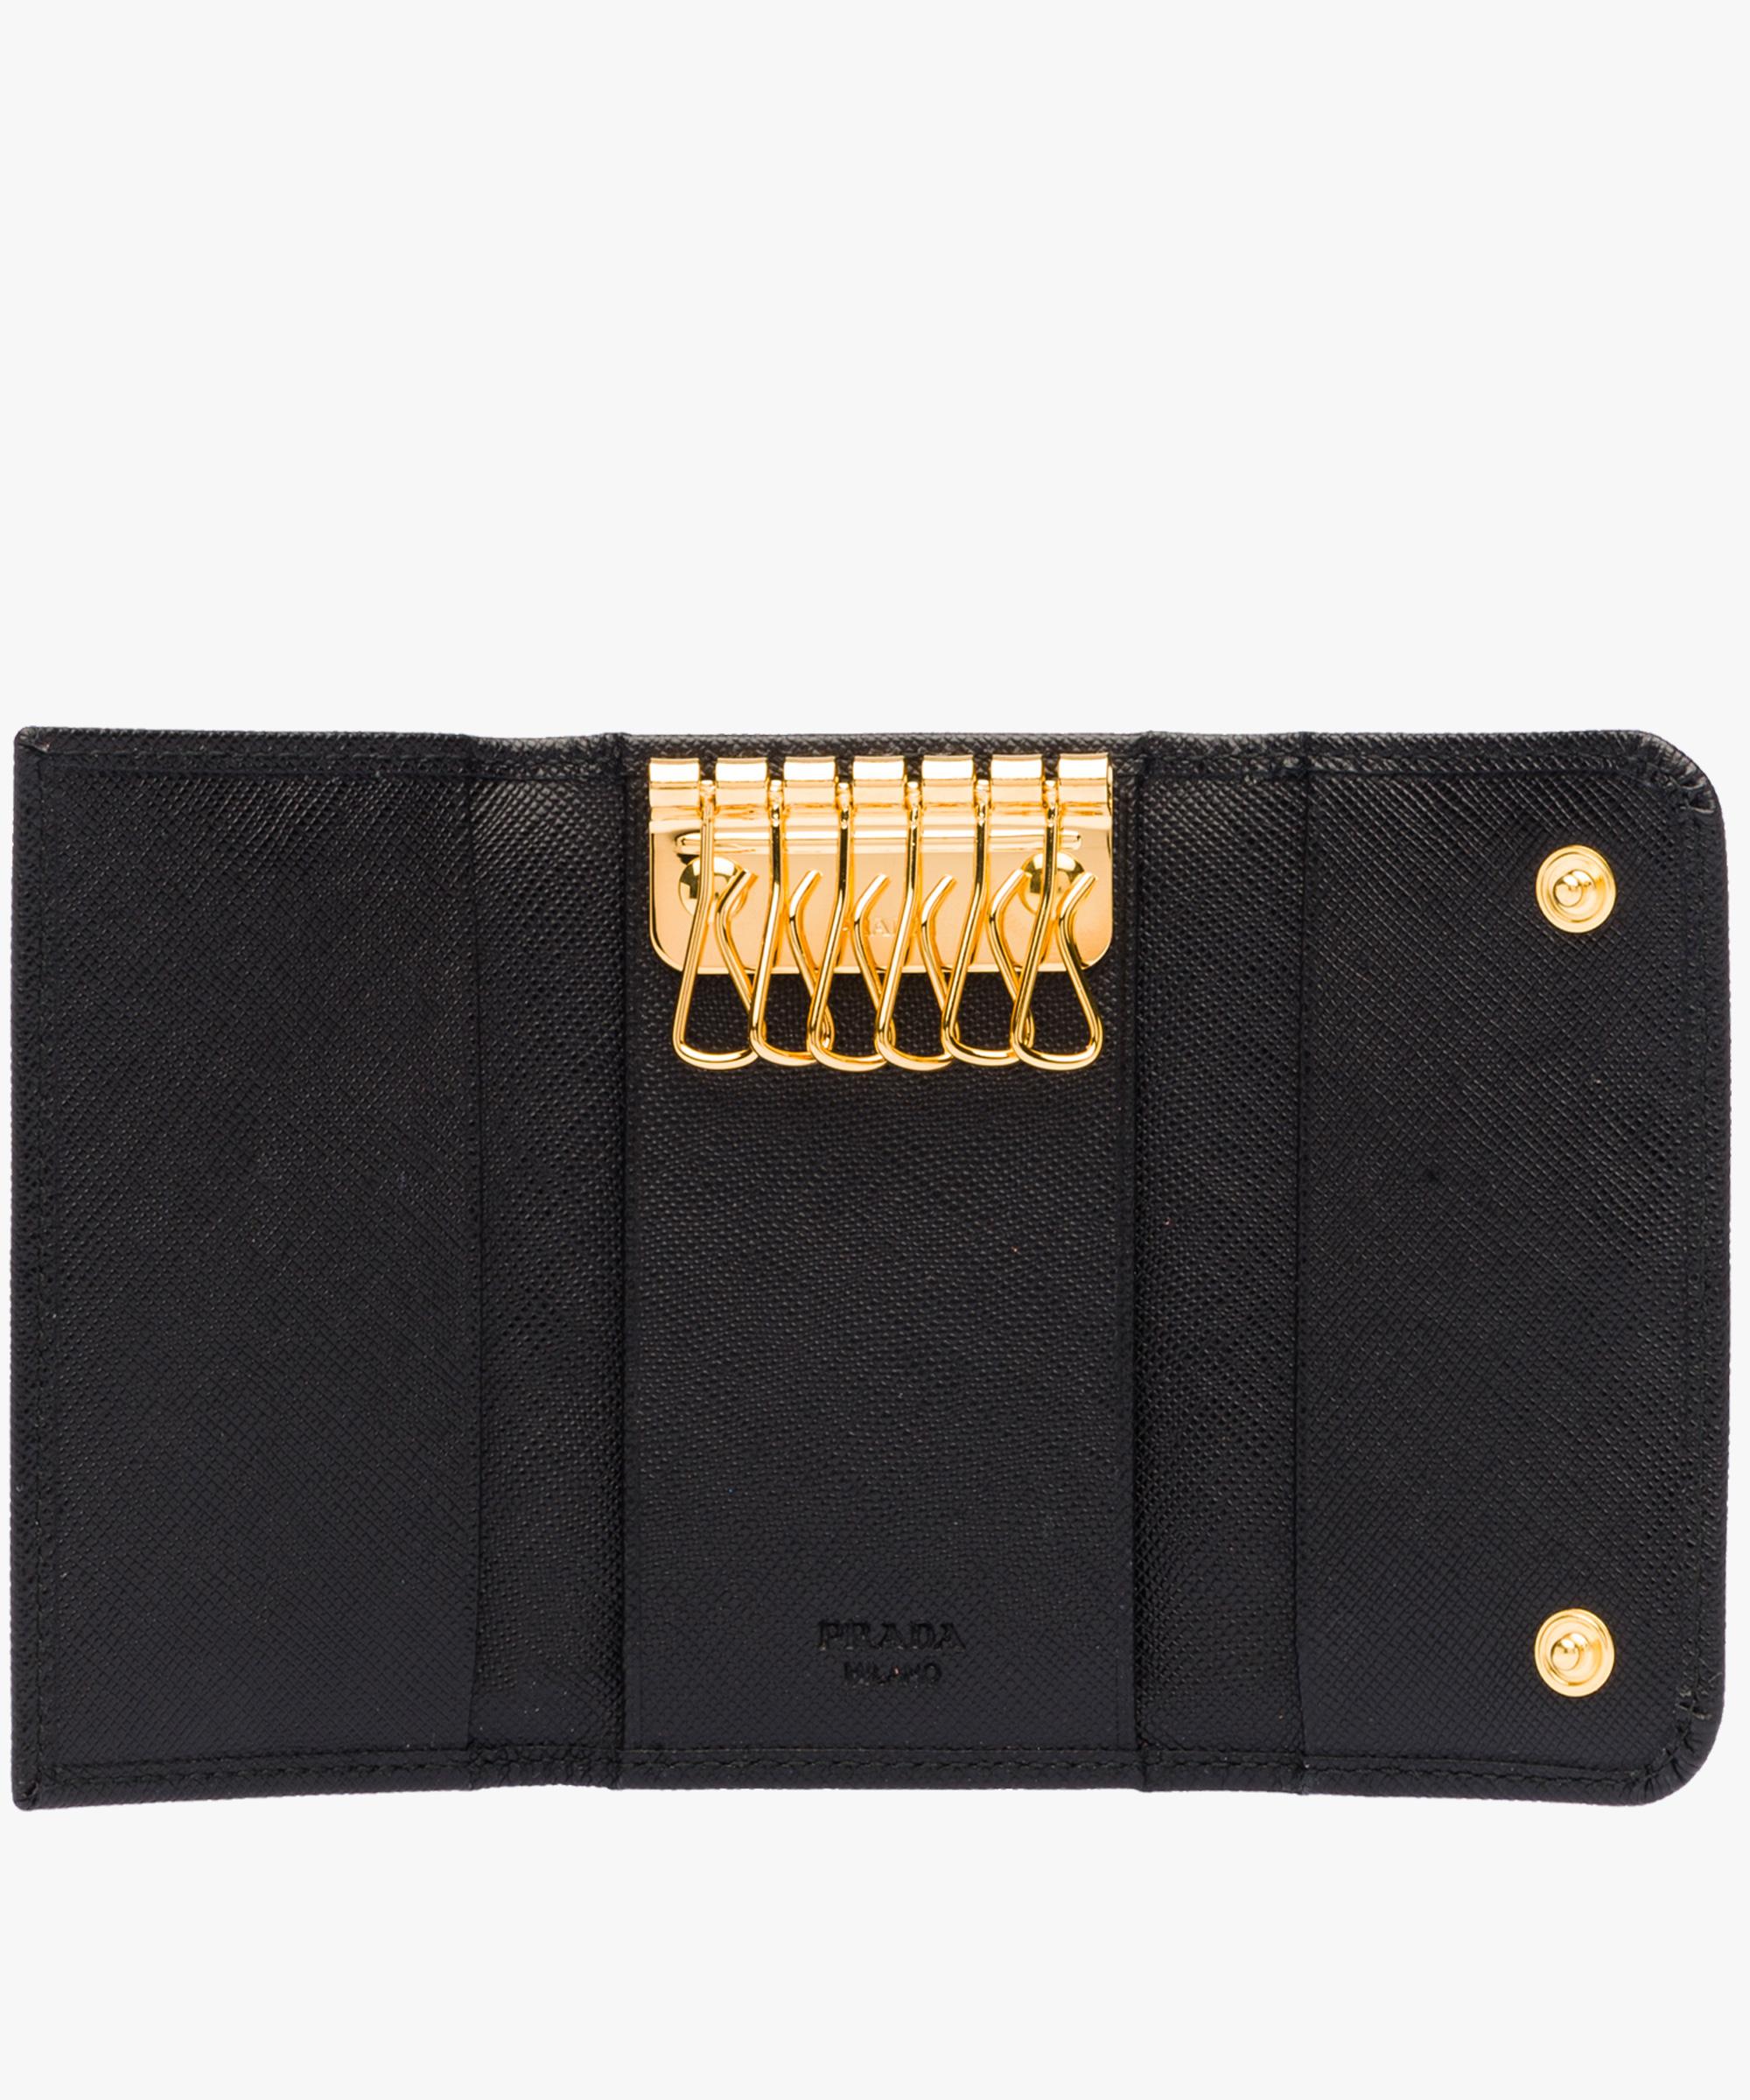 1f8e8a56208e69 Leather Keyholder Prada BLACK ...